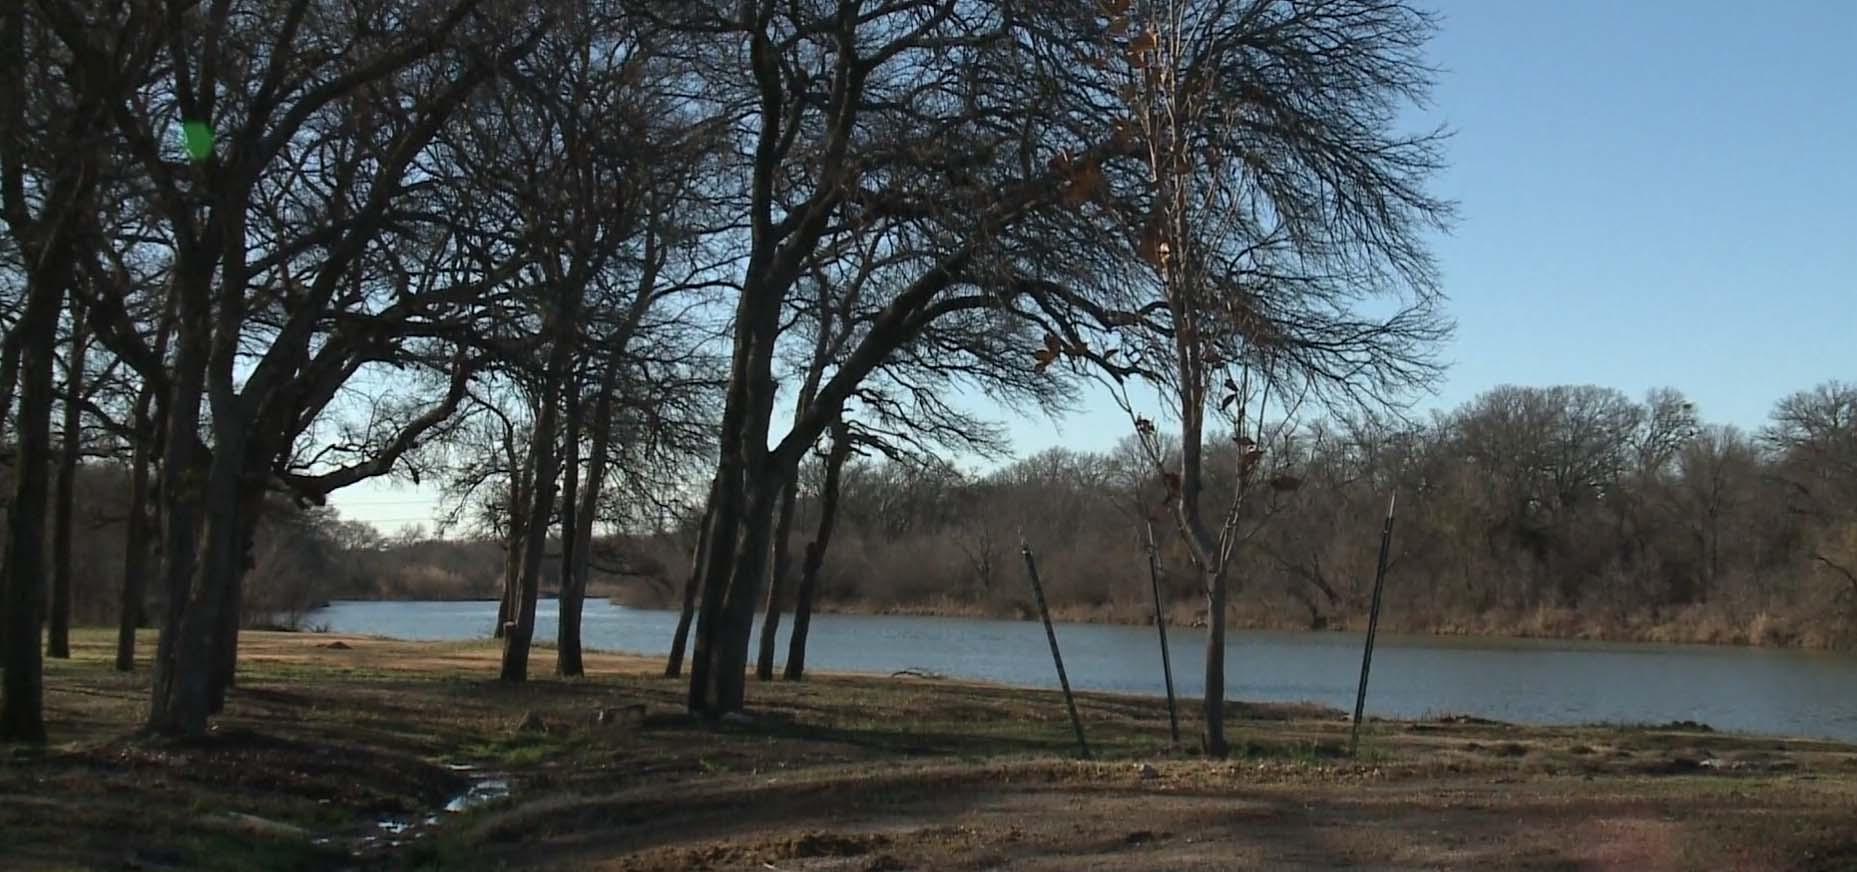 Trinity River wasteland